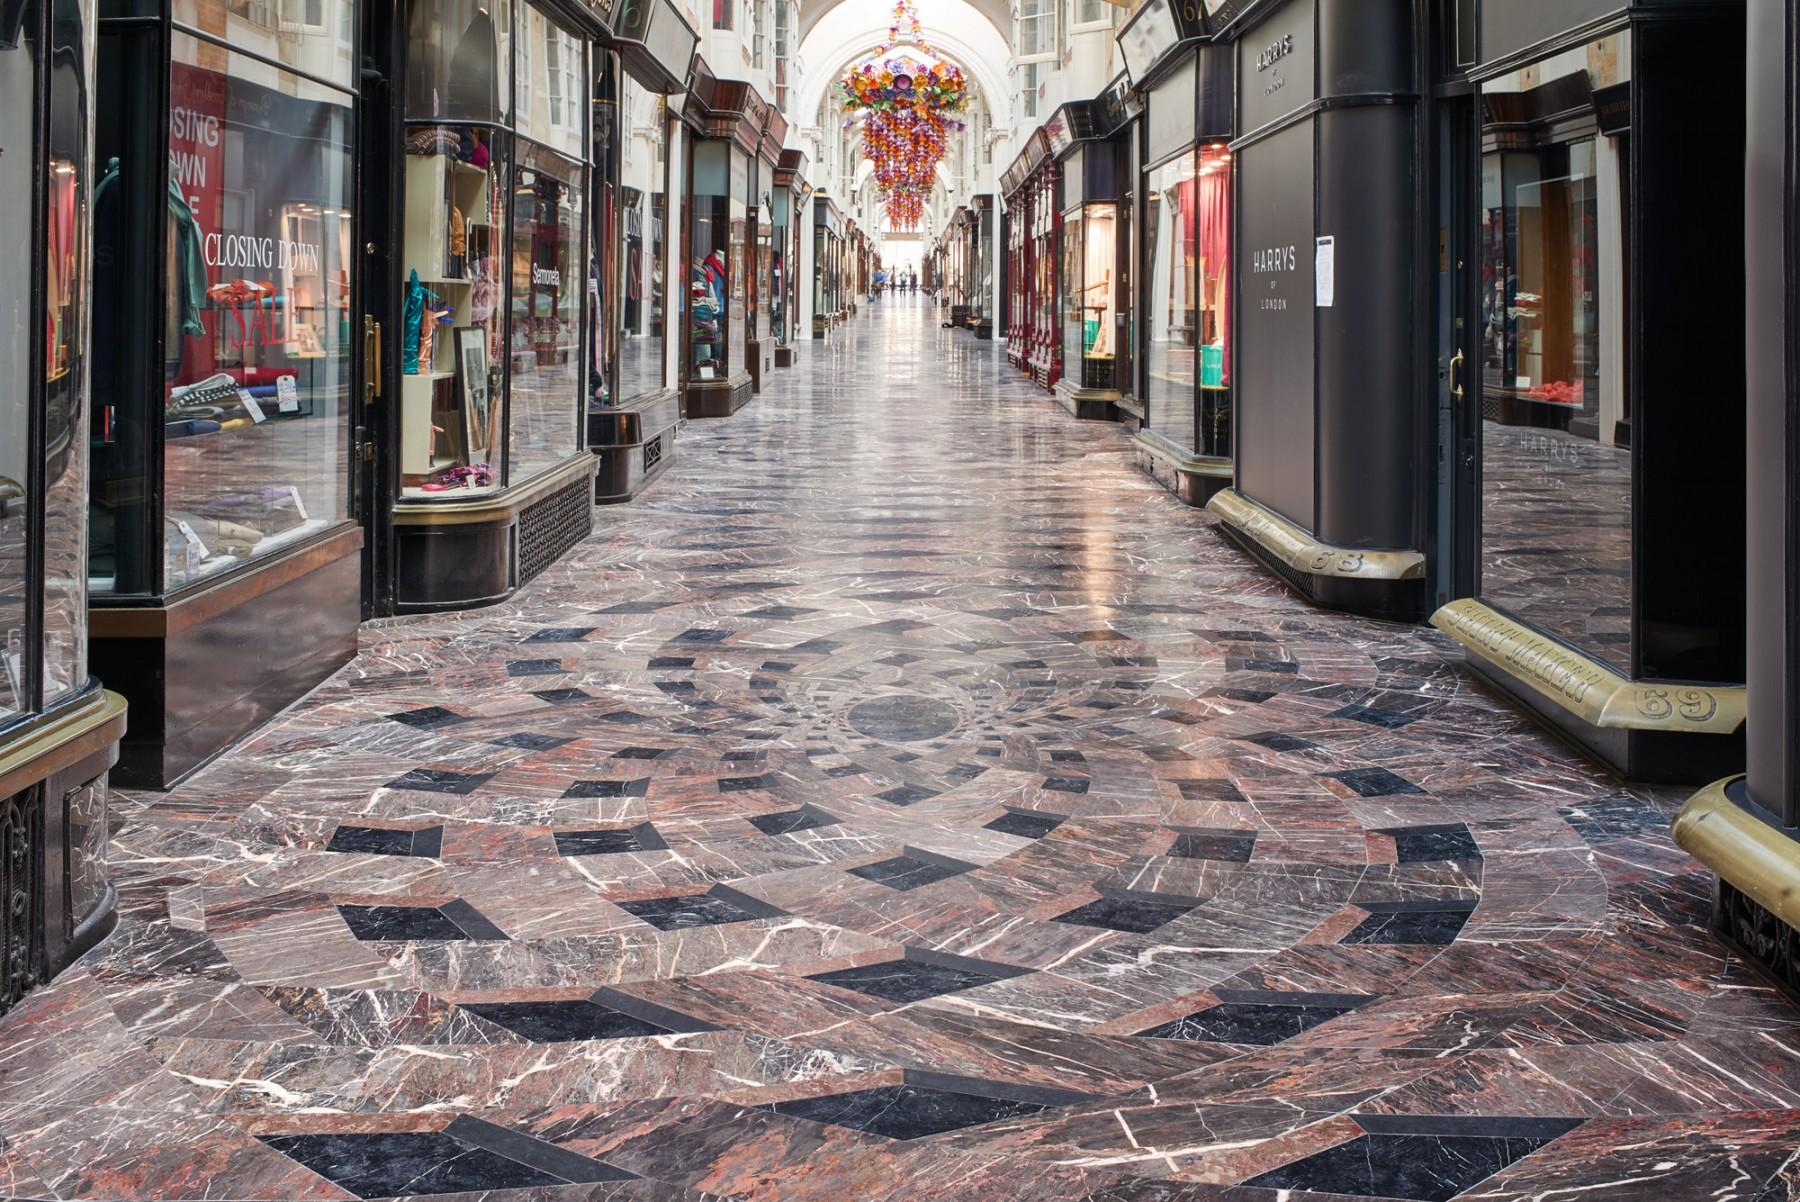 Burlington-Arcade-Piccadilly-London-Royal-Academy Jamie-Fobert-Architects- British-stone-floor-marble-mosaic-interior